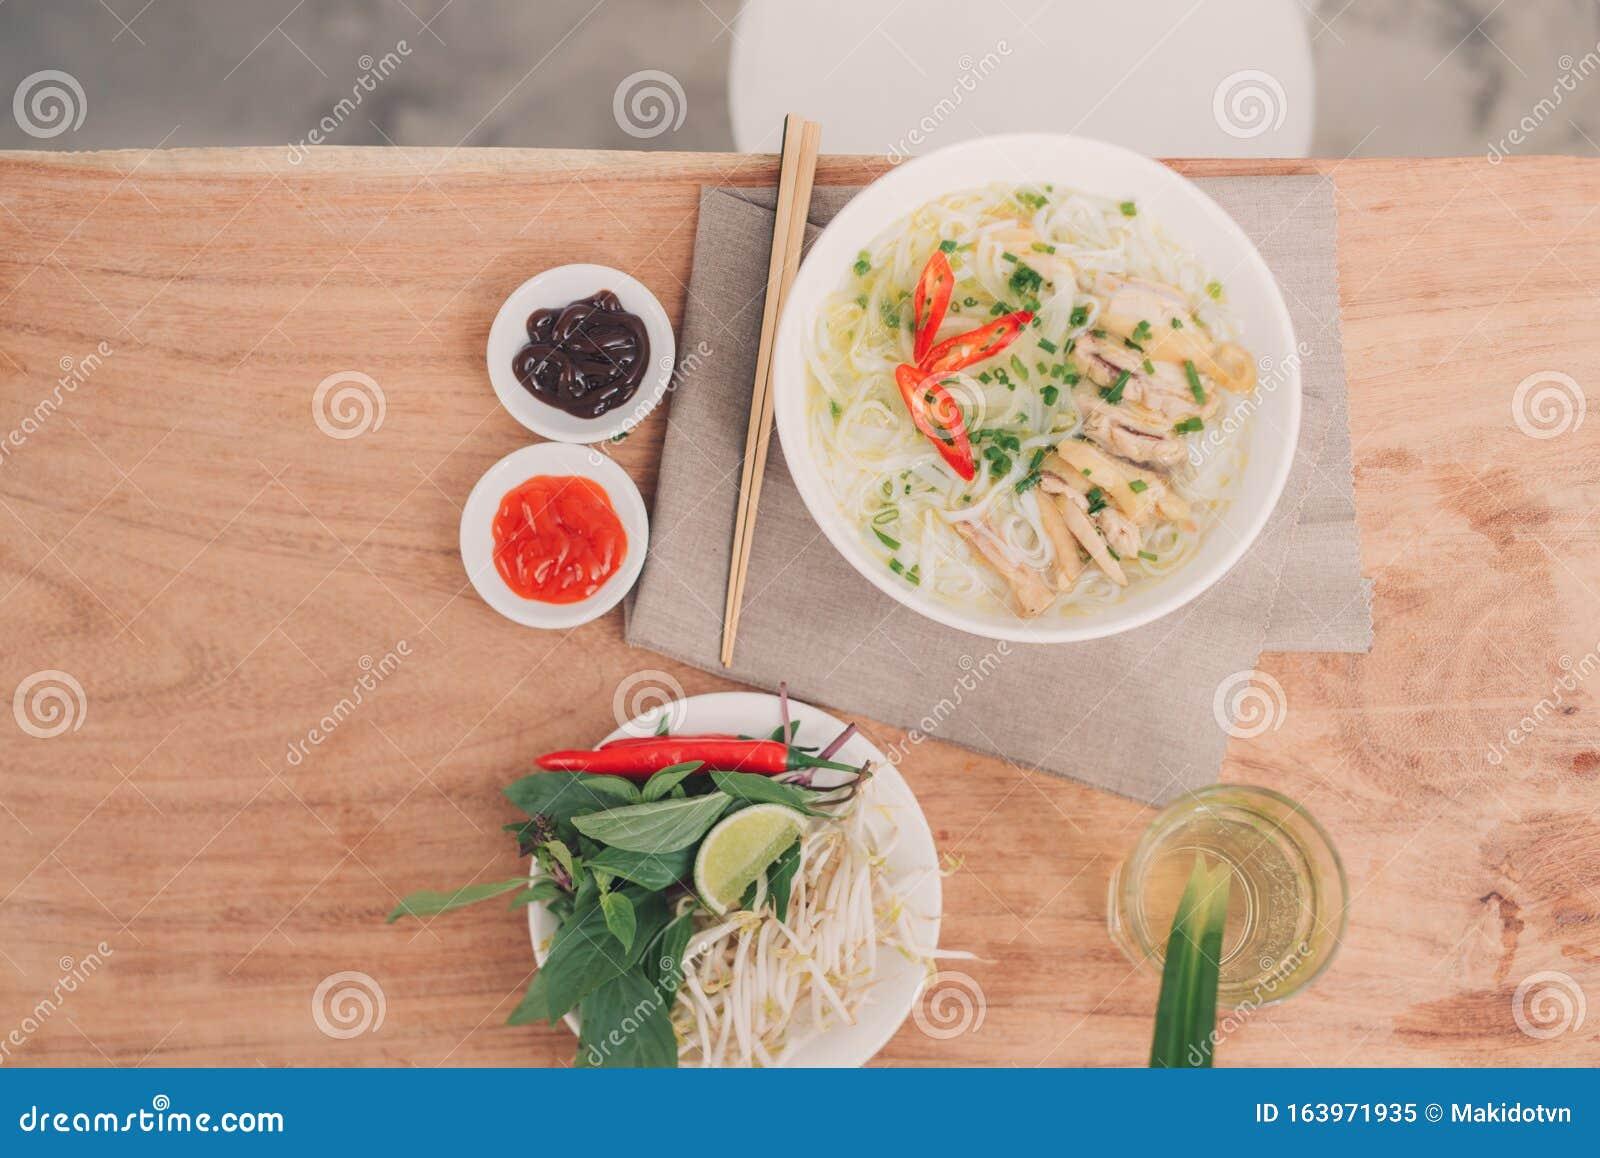 Vietnam Fresh Chili